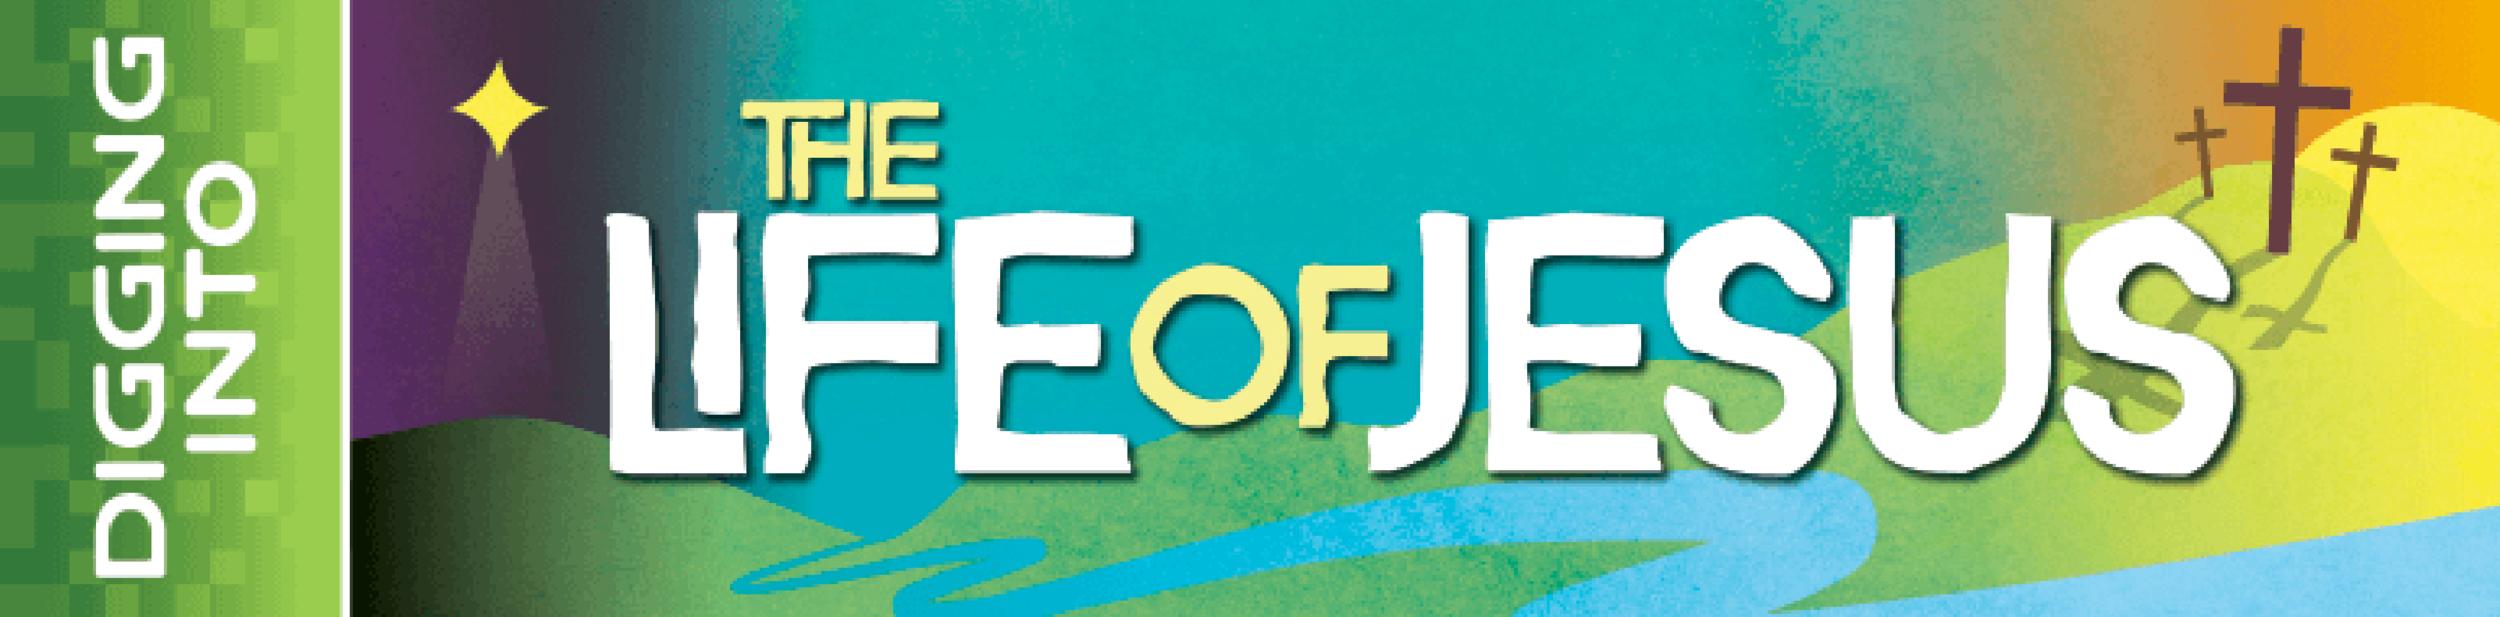 Digging into Jesus_Primary Logo copy.png